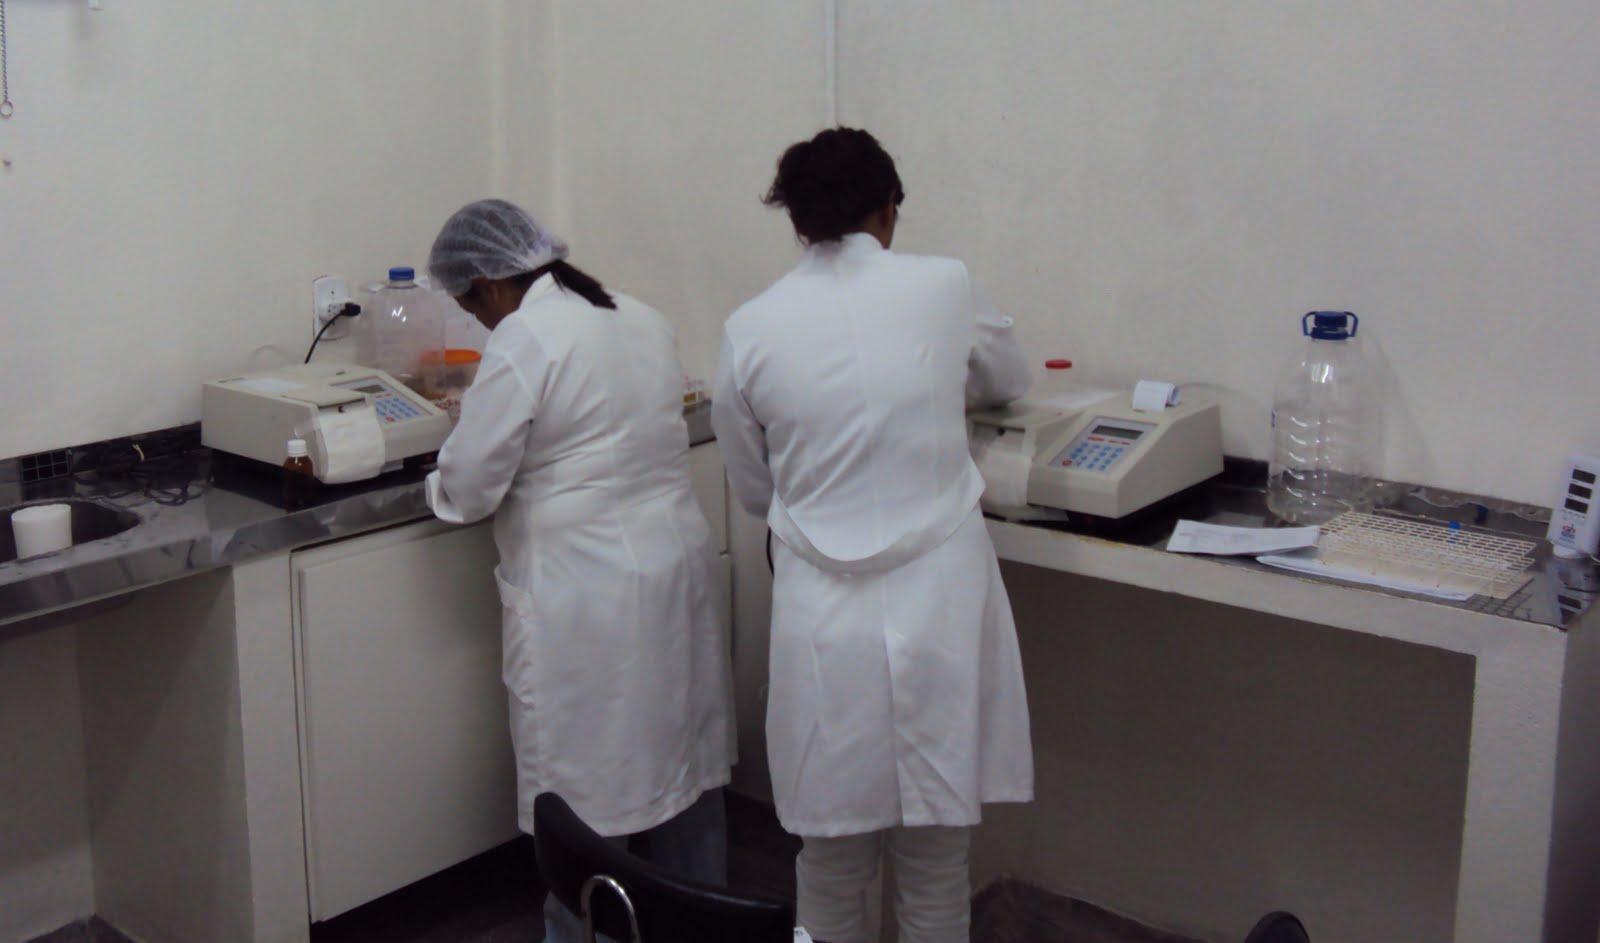 Exame sangue oculto nas fezes